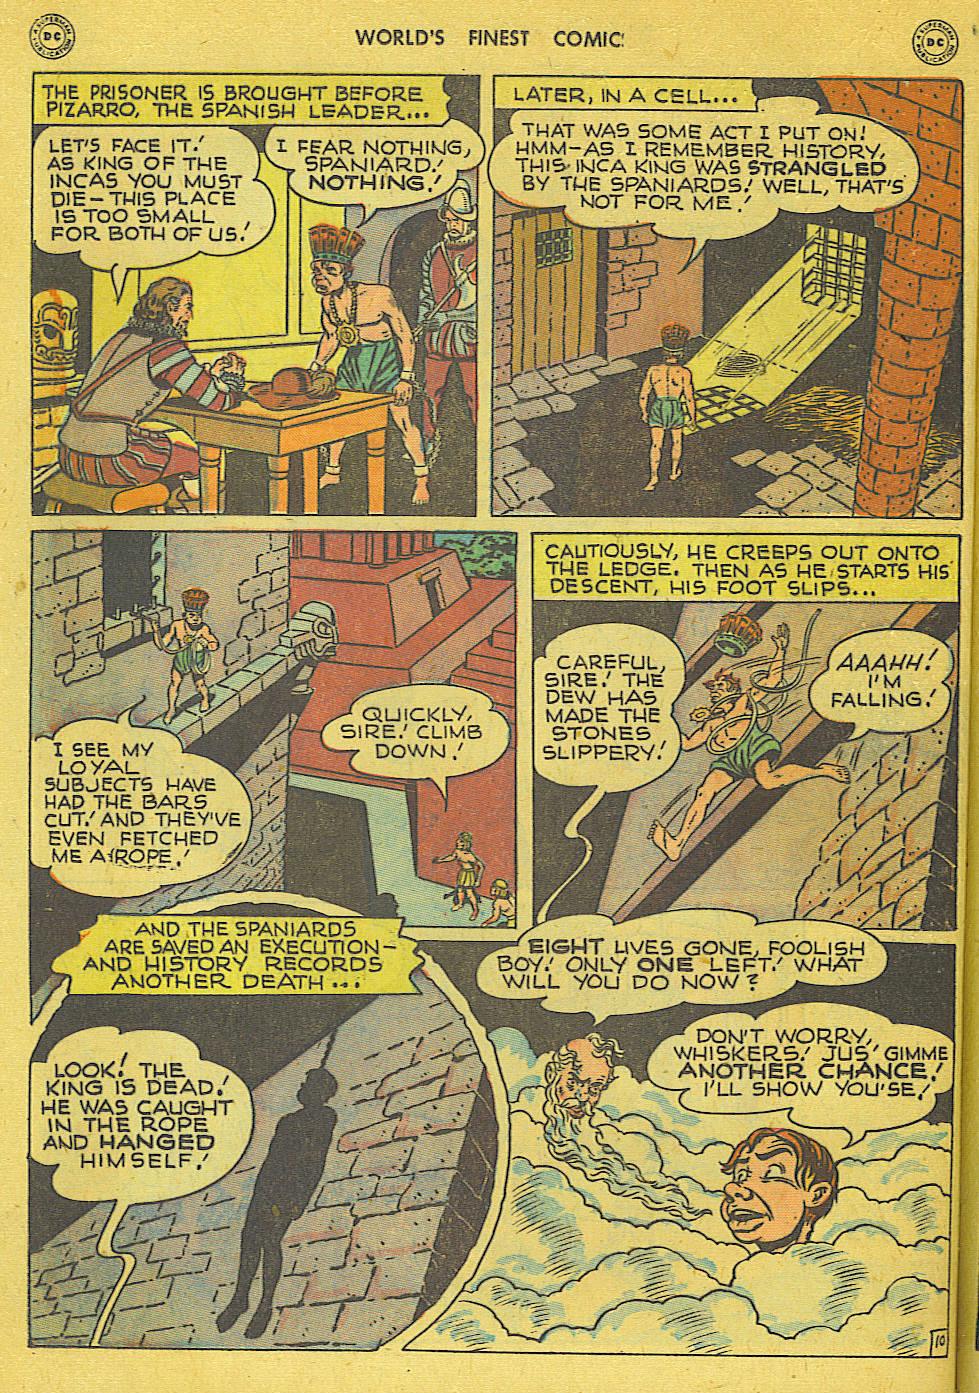 Read online World's Finest Comics comic -  Issue #34 - 36